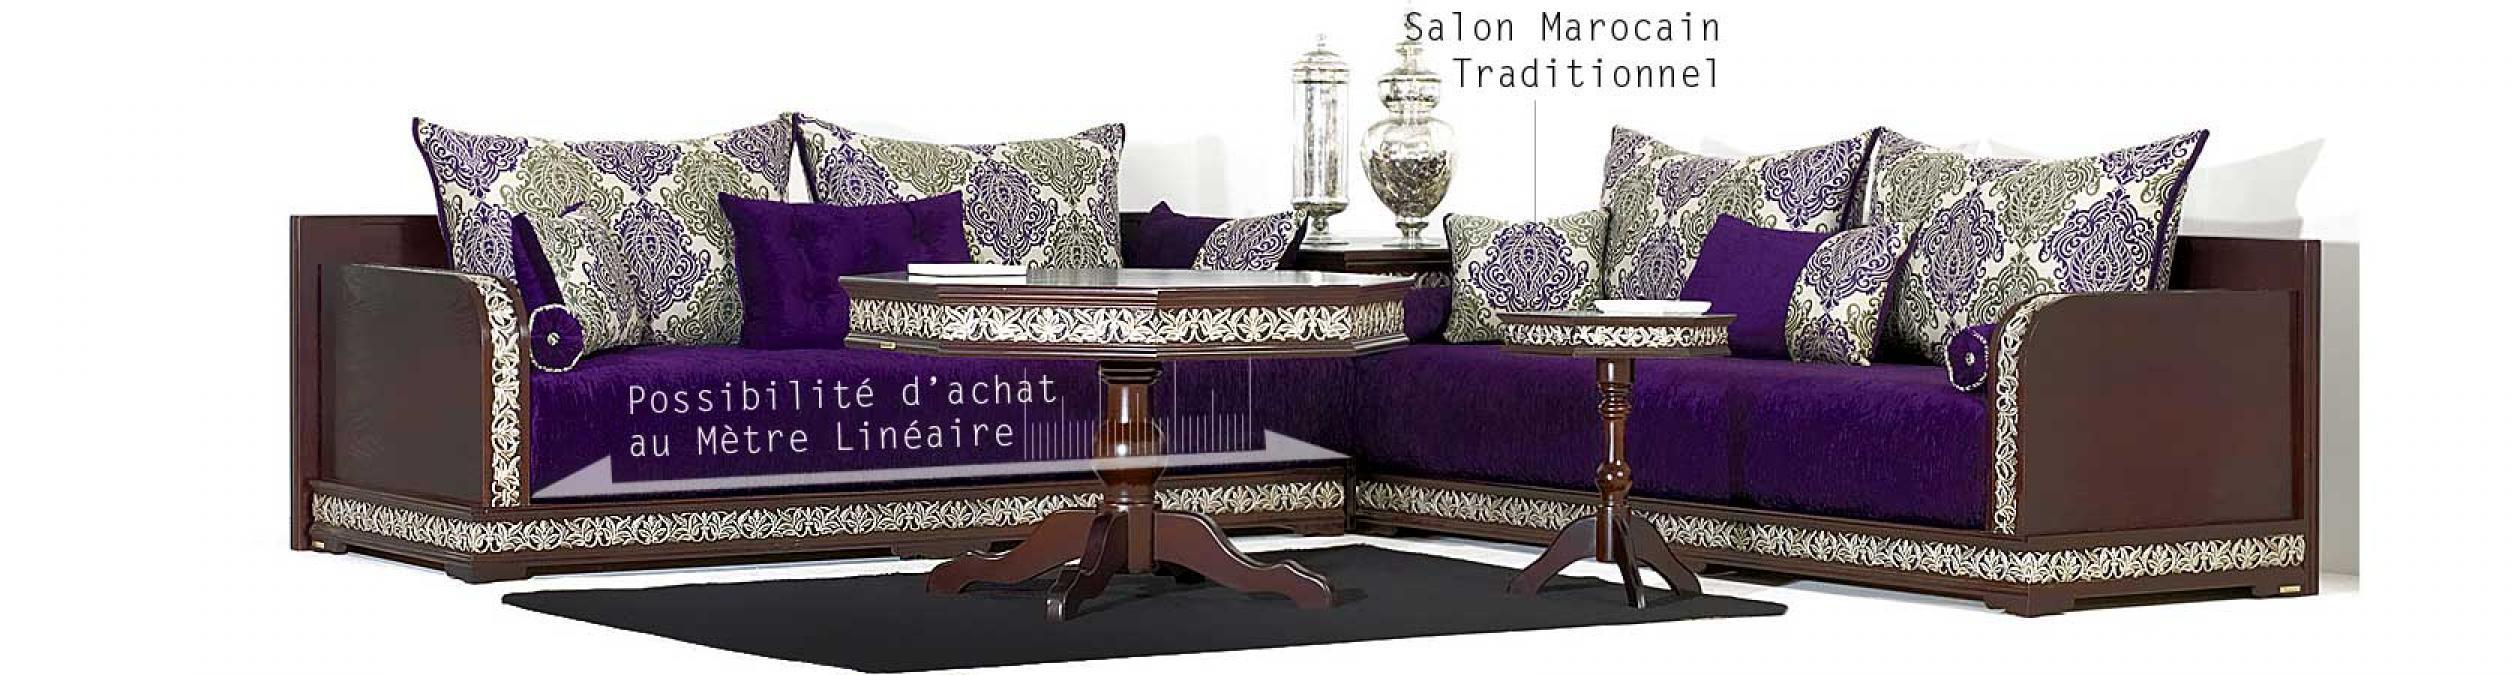 canape marocain belgique photos in november 2017. Black Bedroom Furniture Sets. Home Design Ideas